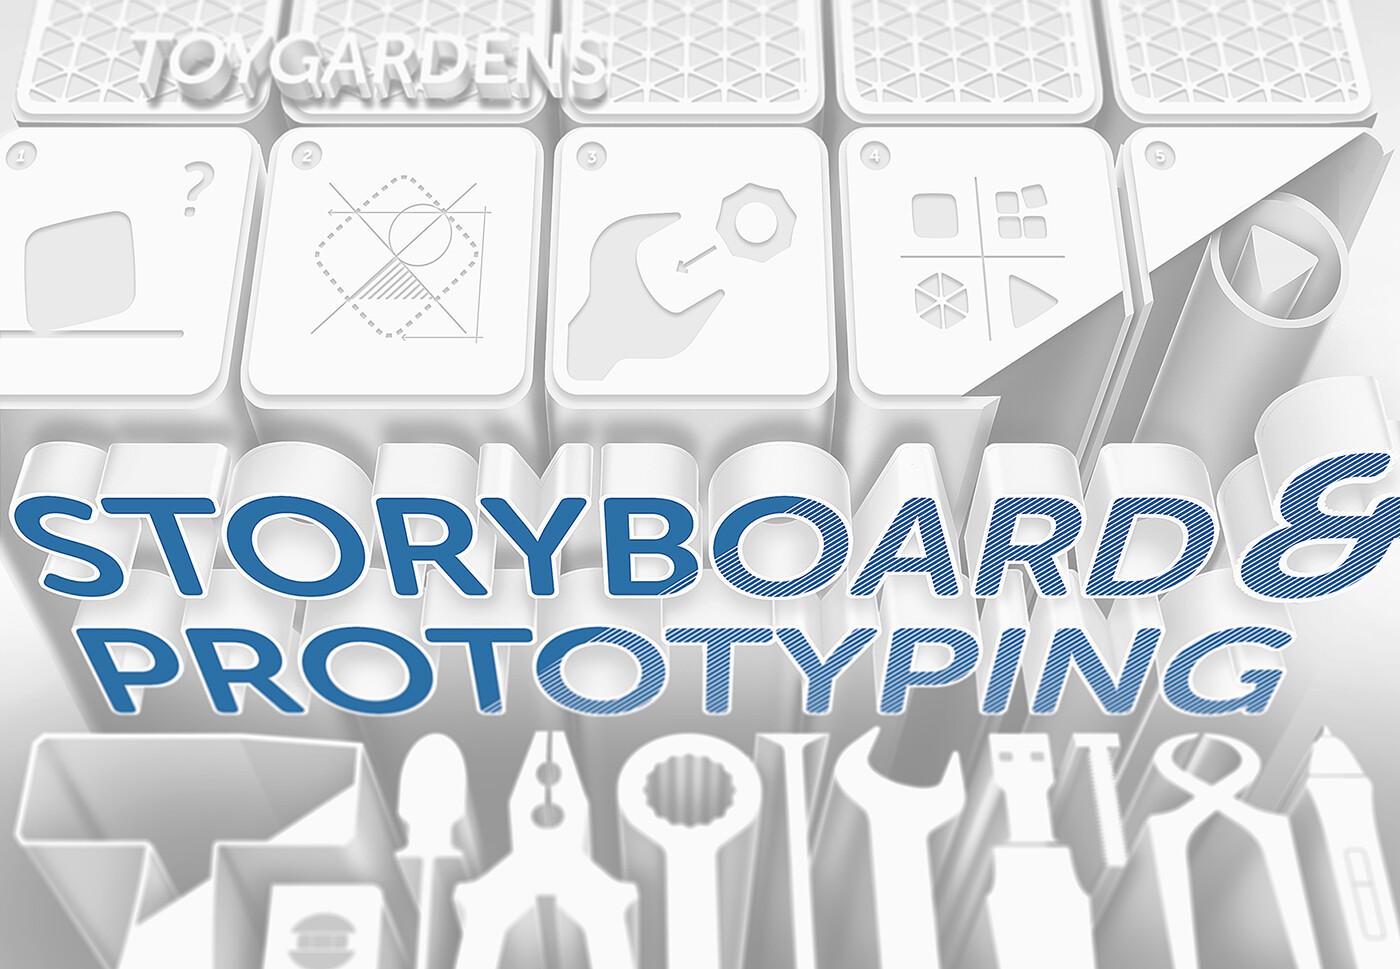 Storyboard & Prototyping